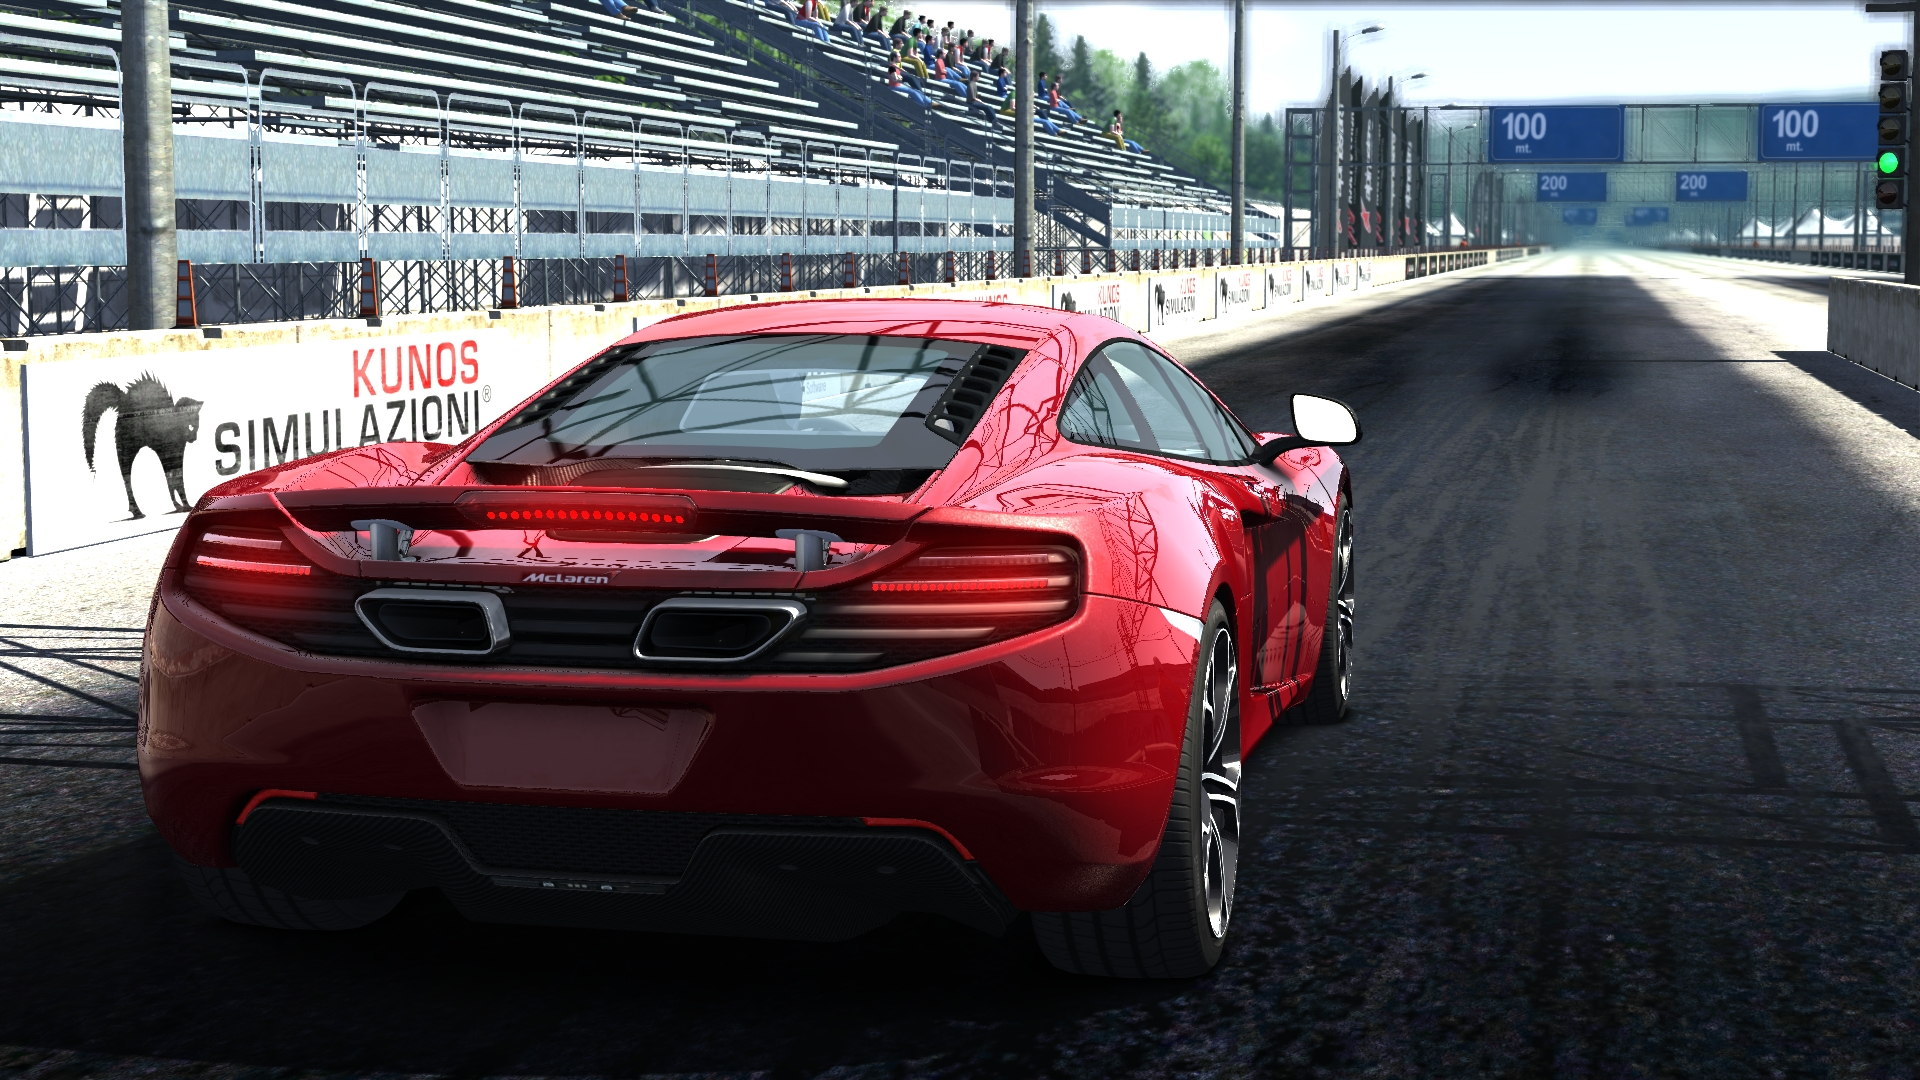 McLaren 12C @ Dragstrip ^^